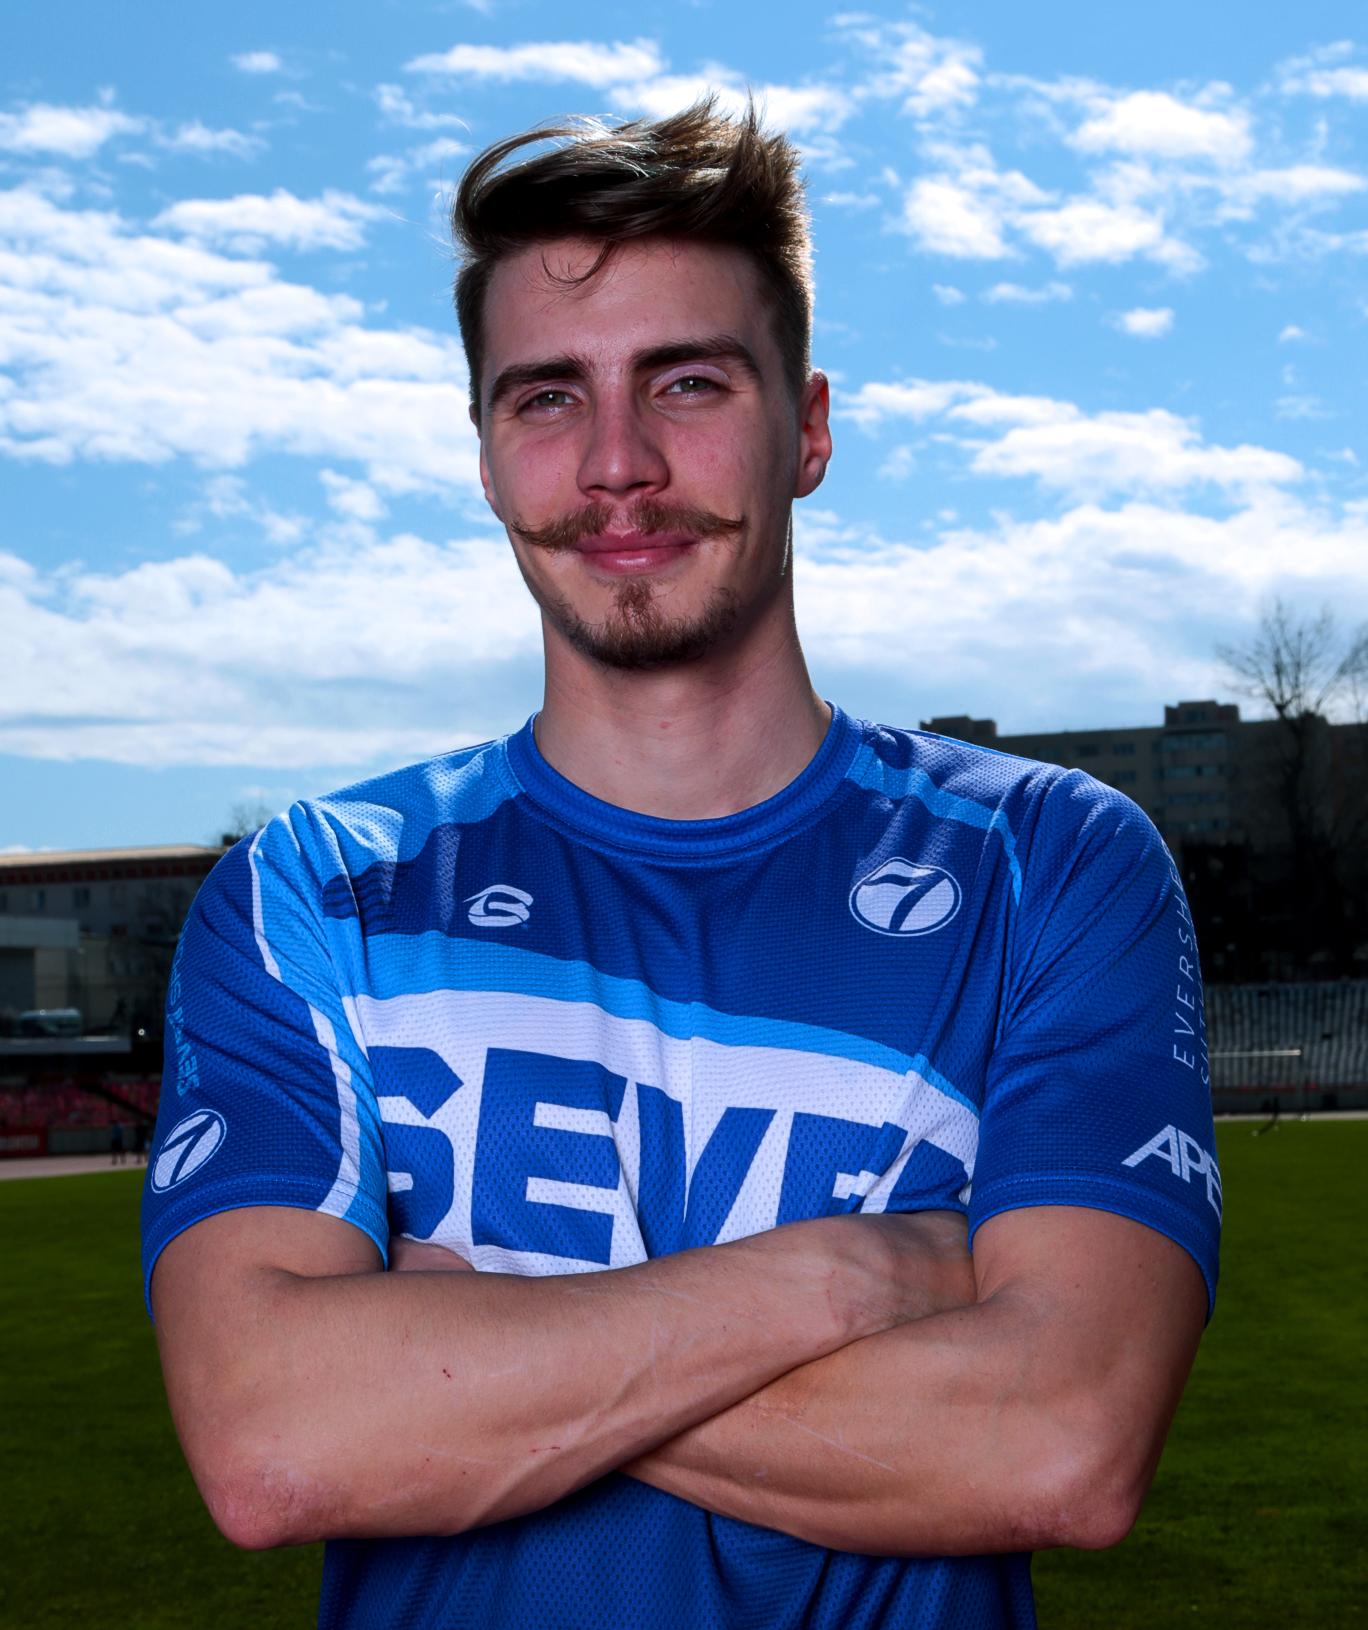 https://www.sevensportclub.ro/wp-content/uploads/2020/10/Antrenori_684x815_Alexandru.jpg